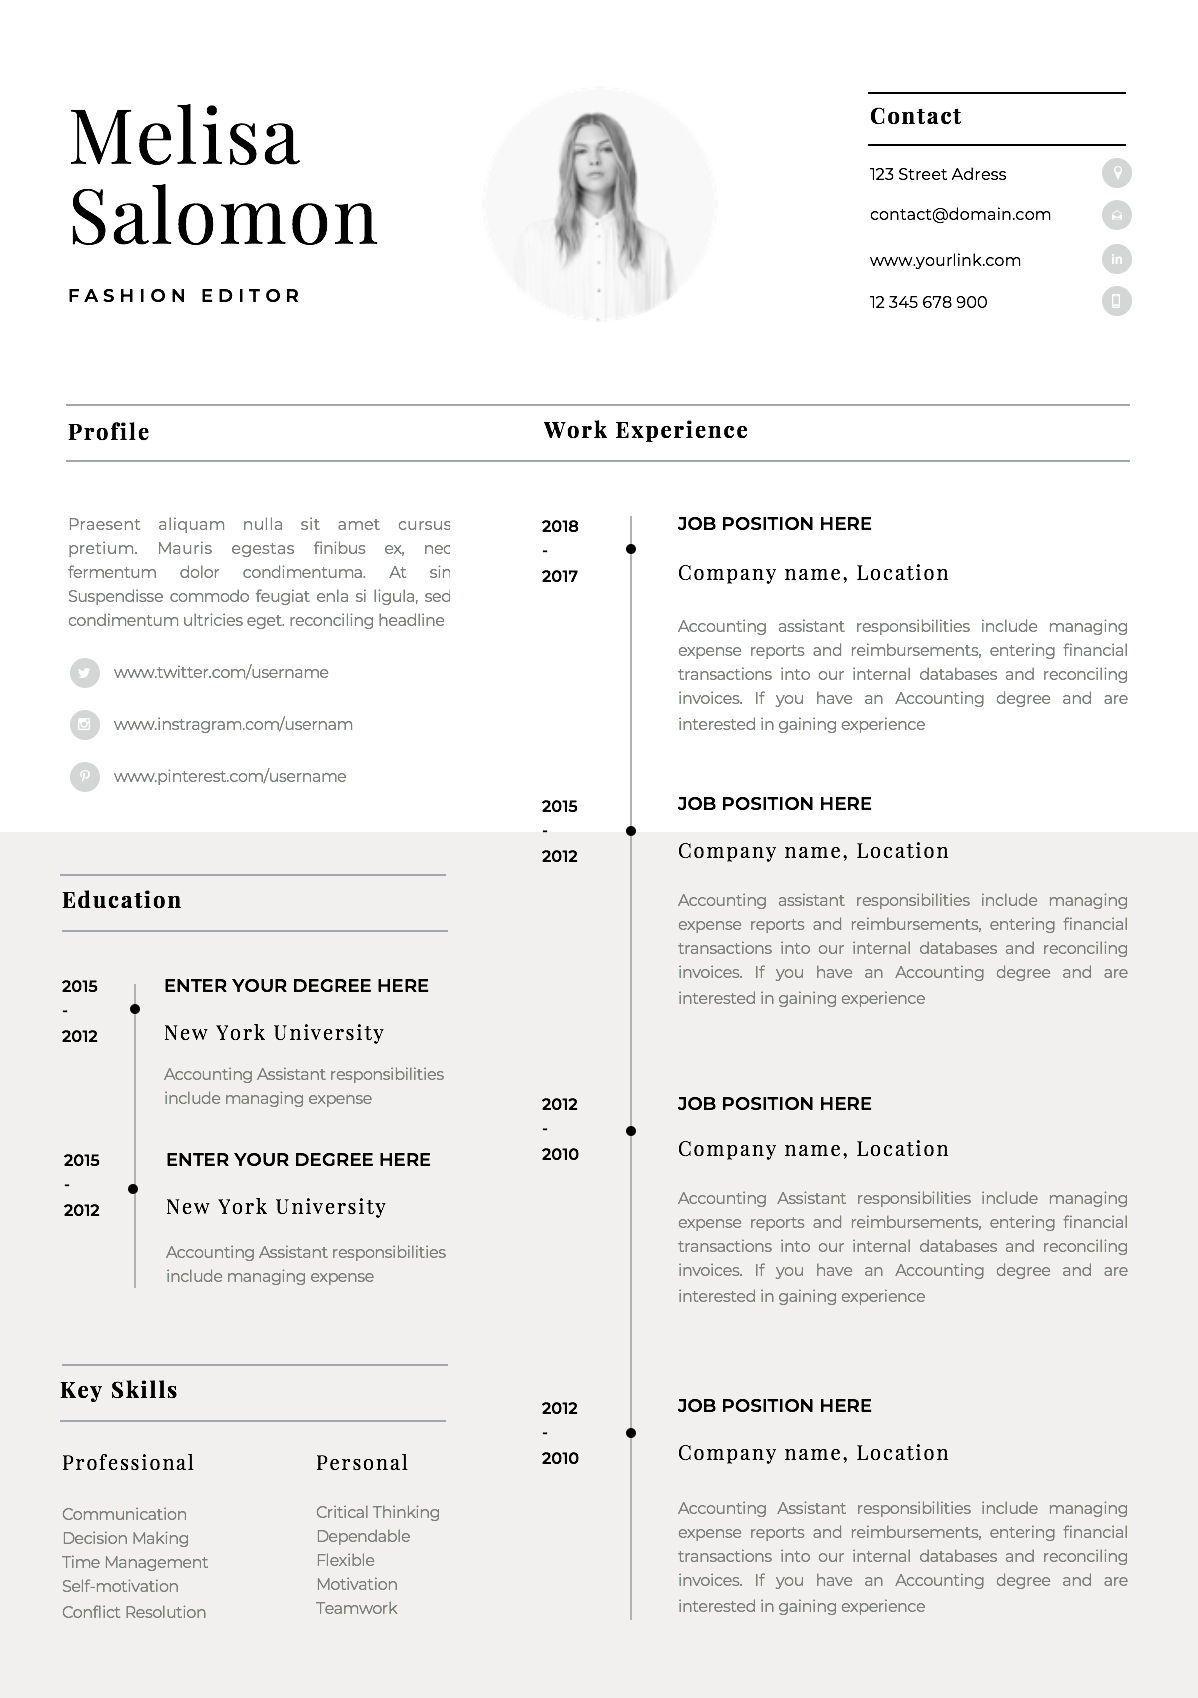 001 Impressive One Page Resume Template Idea  Templates Microsoft Word FreeFull